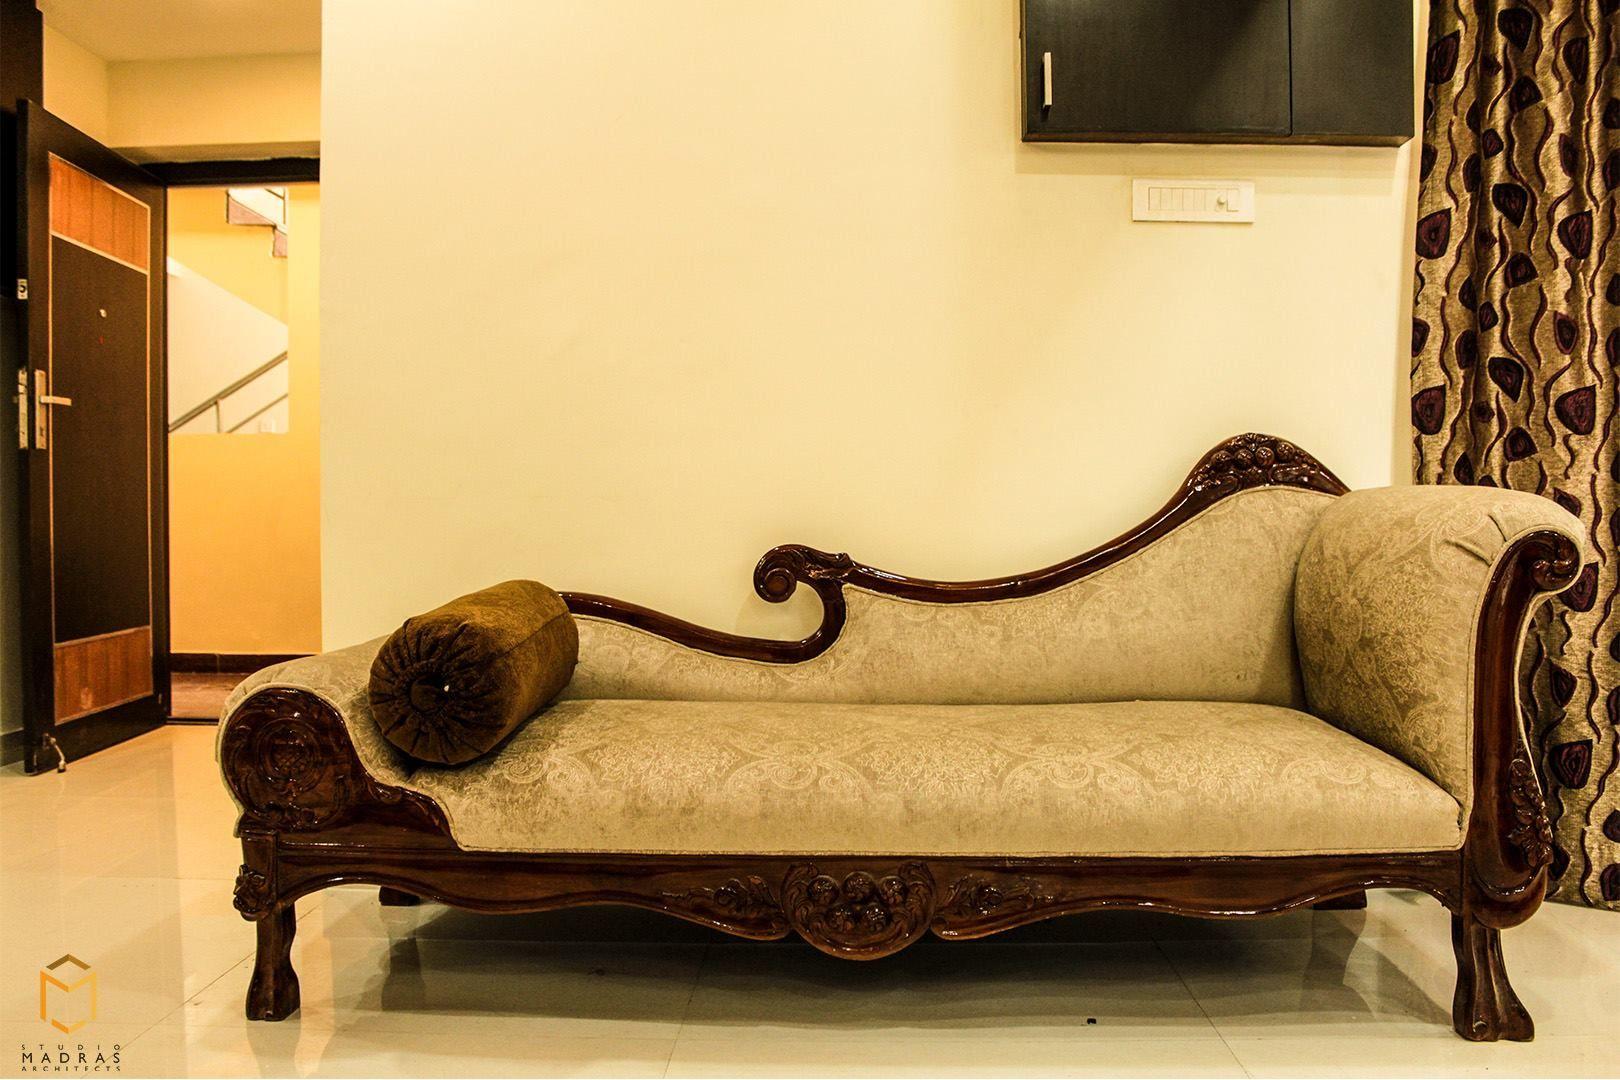 Sofa Set Online Olx Hyderabad Diwan Pics Home Imgurl